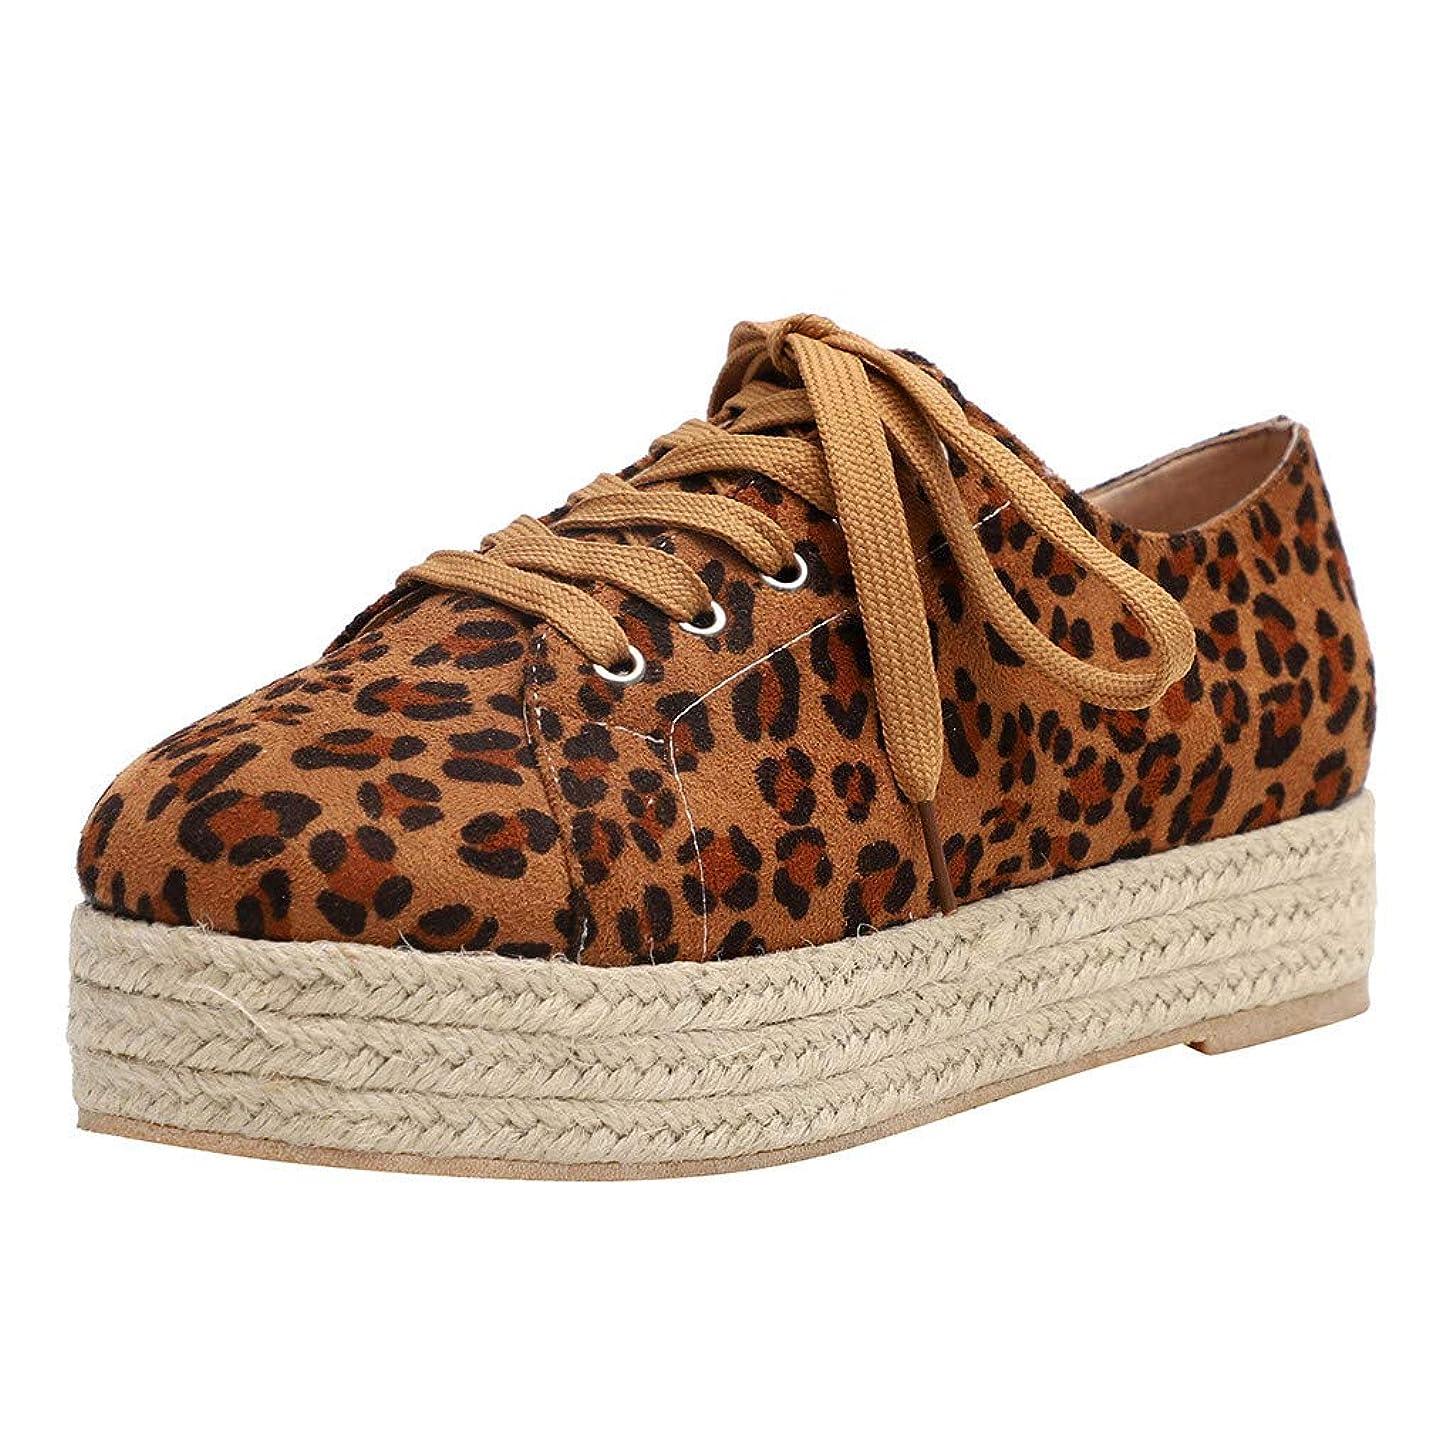 Sherostore ? Women's Trendy Leopard Elastic Low Top Canvas Loafers Platform Skate Sneakers Espadrille